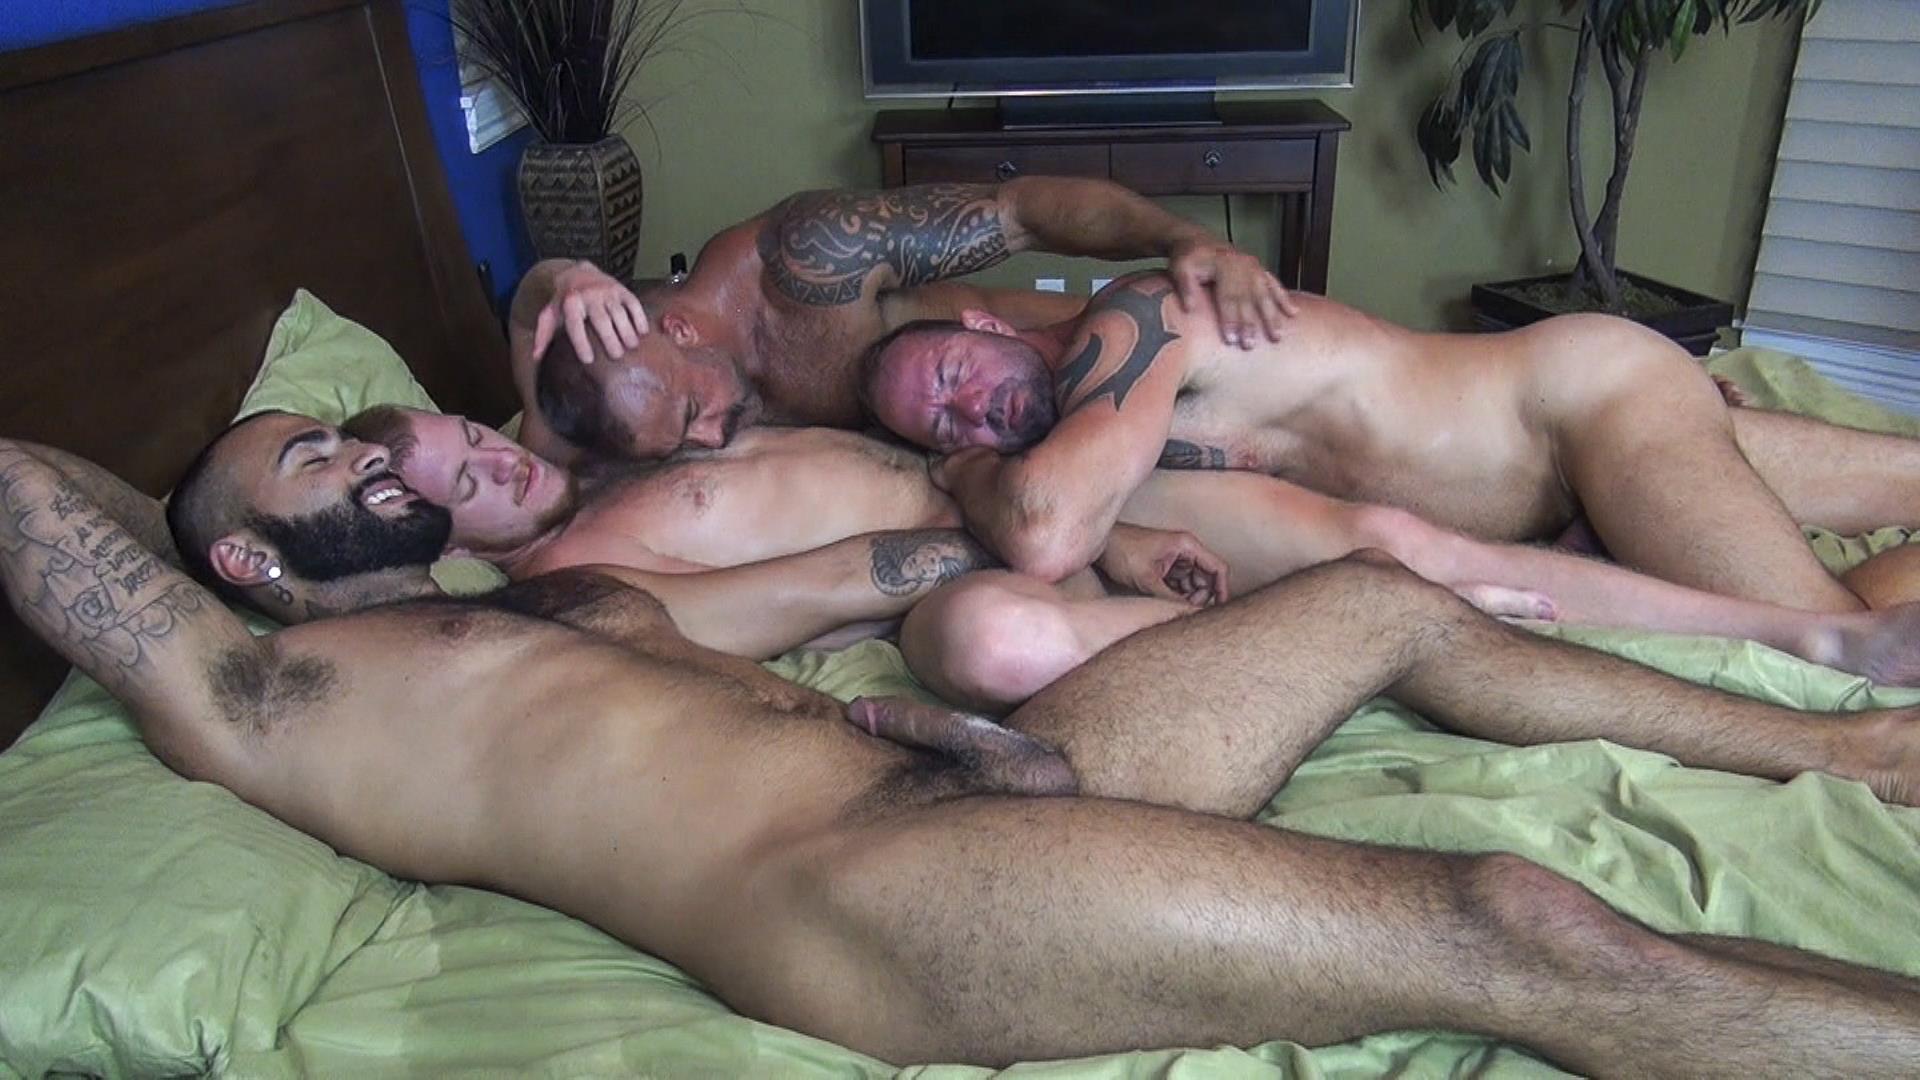 Raw-Fuck-Club-Vic-Rocco-and-Rikk-York-and-Billy-Warren-and-Job-Galt-Bareback-Daddy-Amateur-Gay-Porn-03.jpg